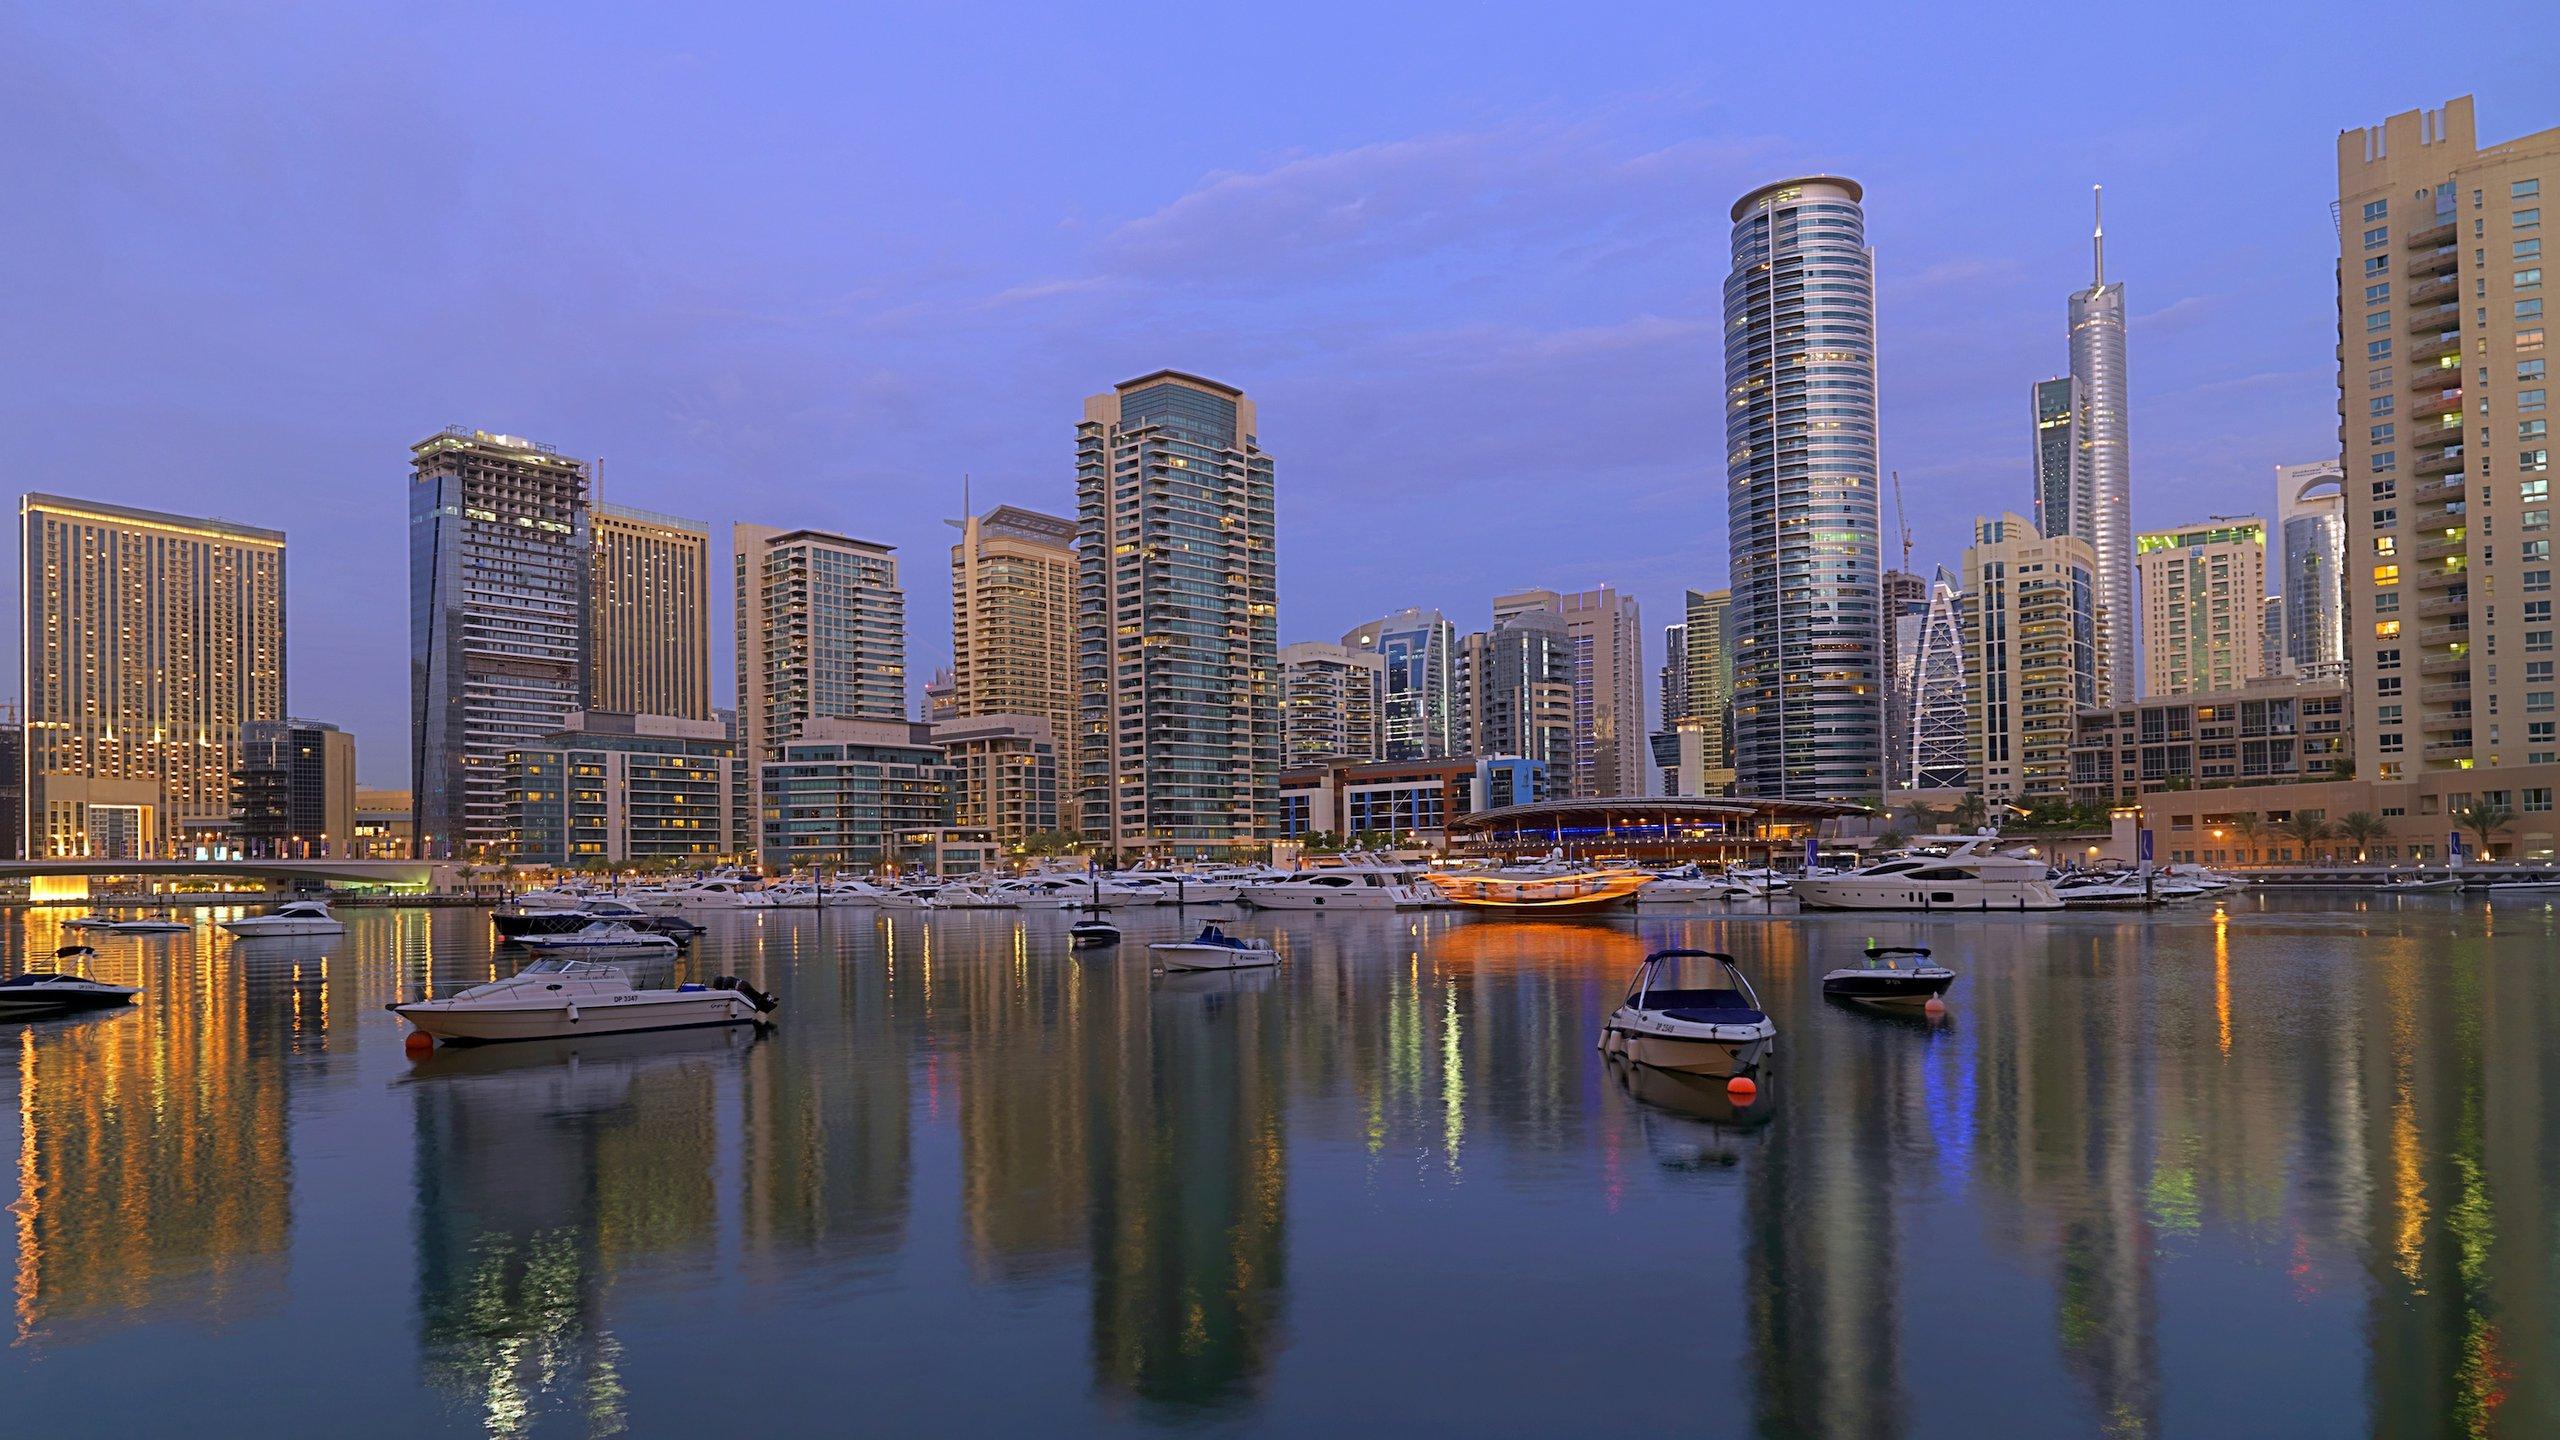 Jumeirah Beach Residence, Dubai, Dubai, Verenigde Arabische Emiraten